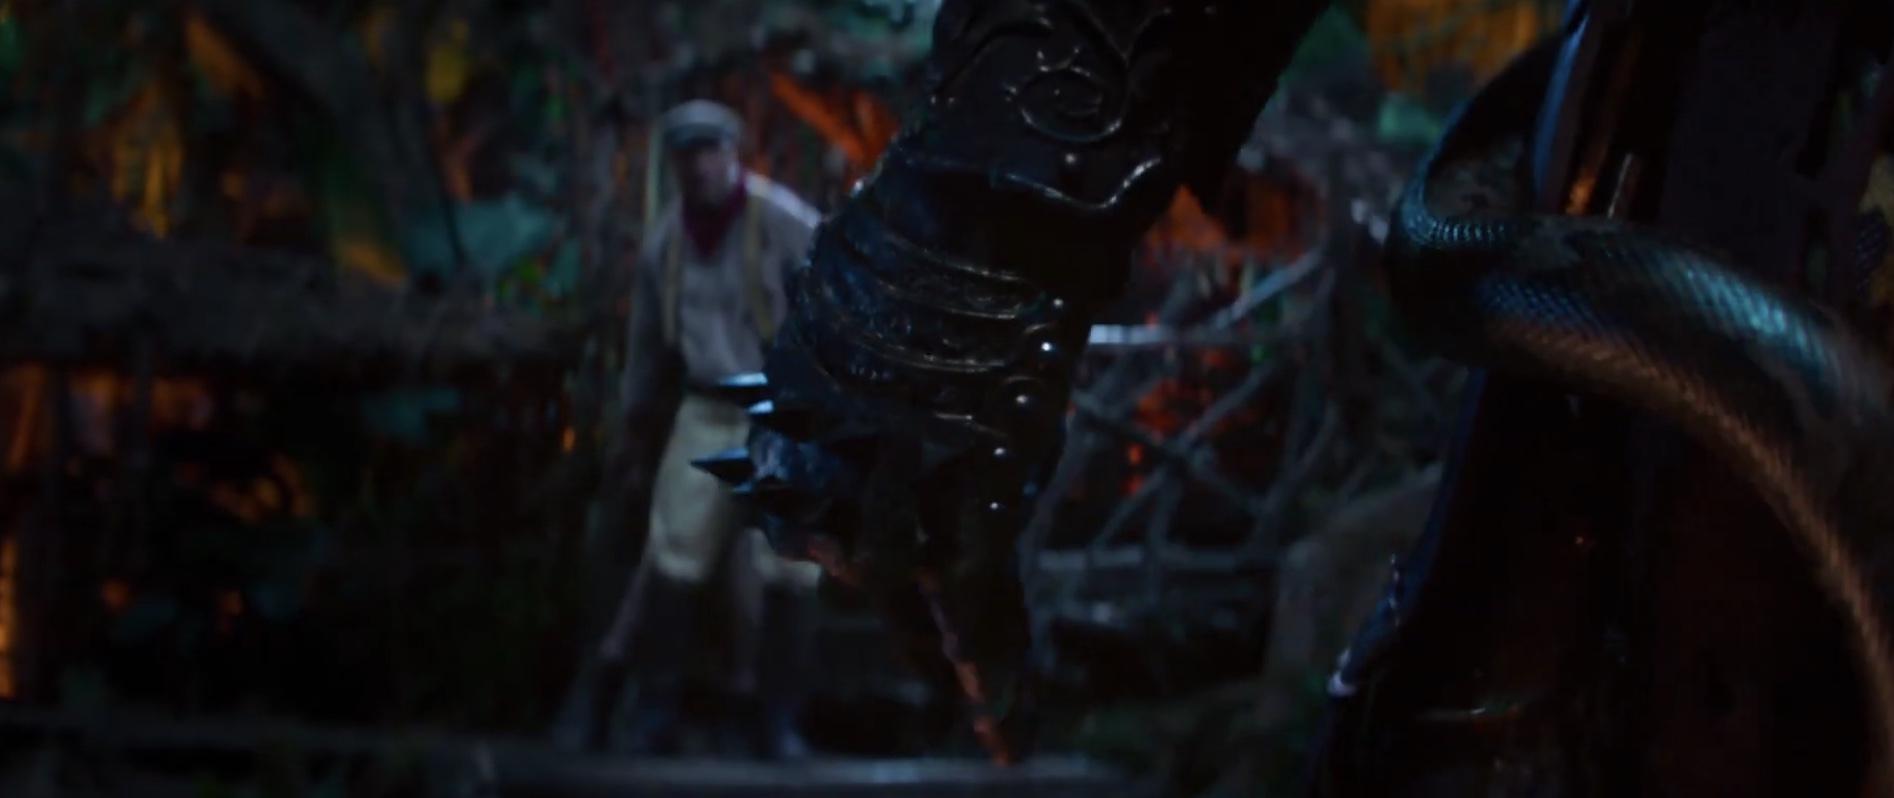 Dwayne Johnson in Jungle Cruise (2021)